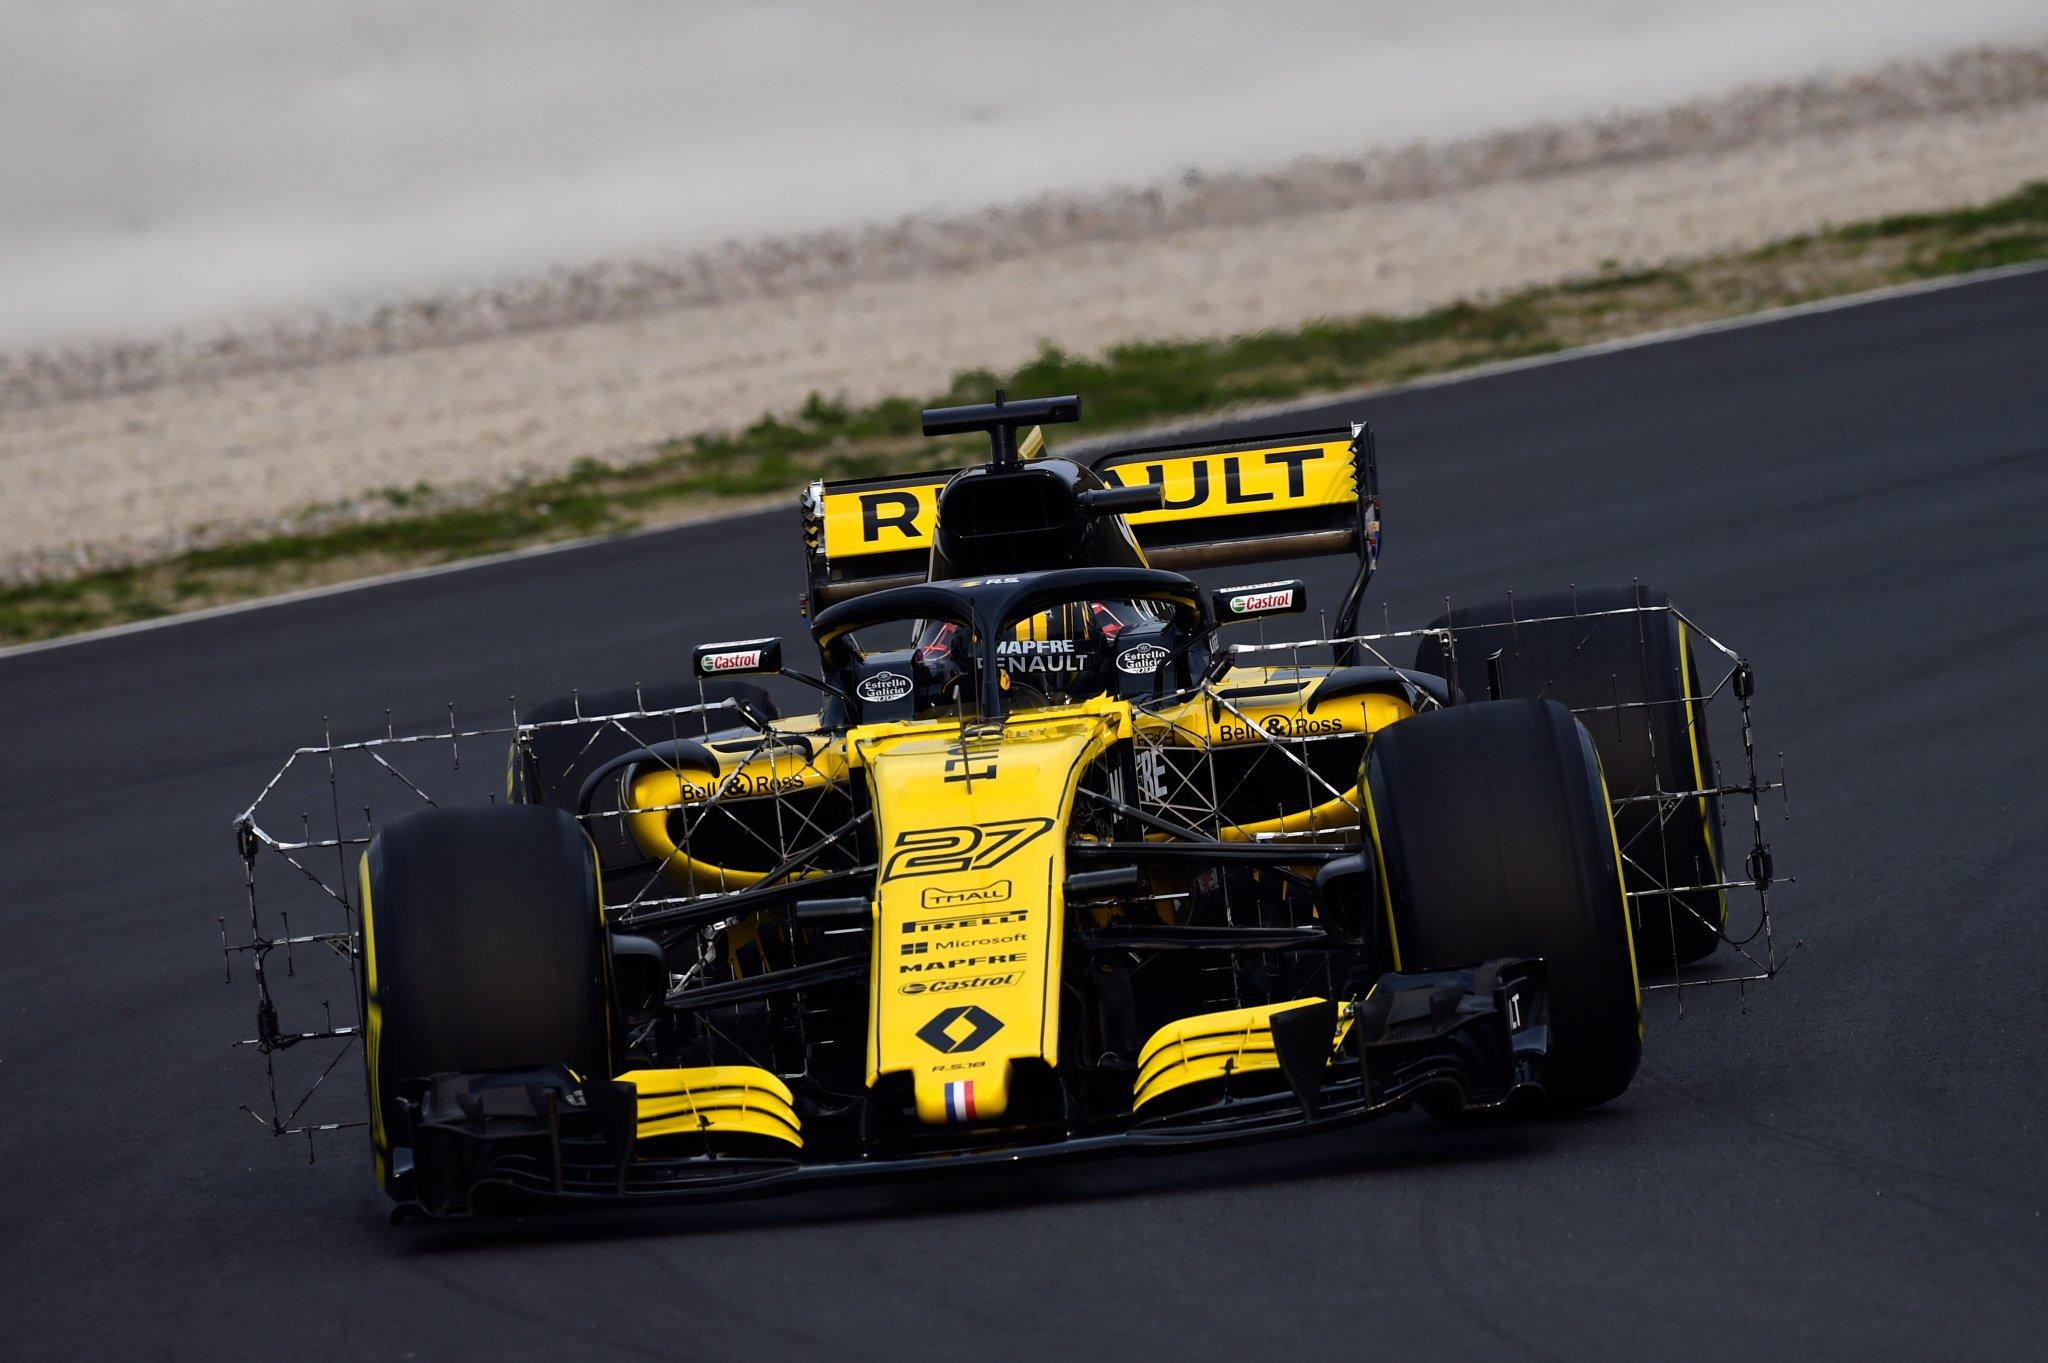 Нико Хюлкенберг за рулём болида Renault на тестах команд Формулы-1 в Барселоне